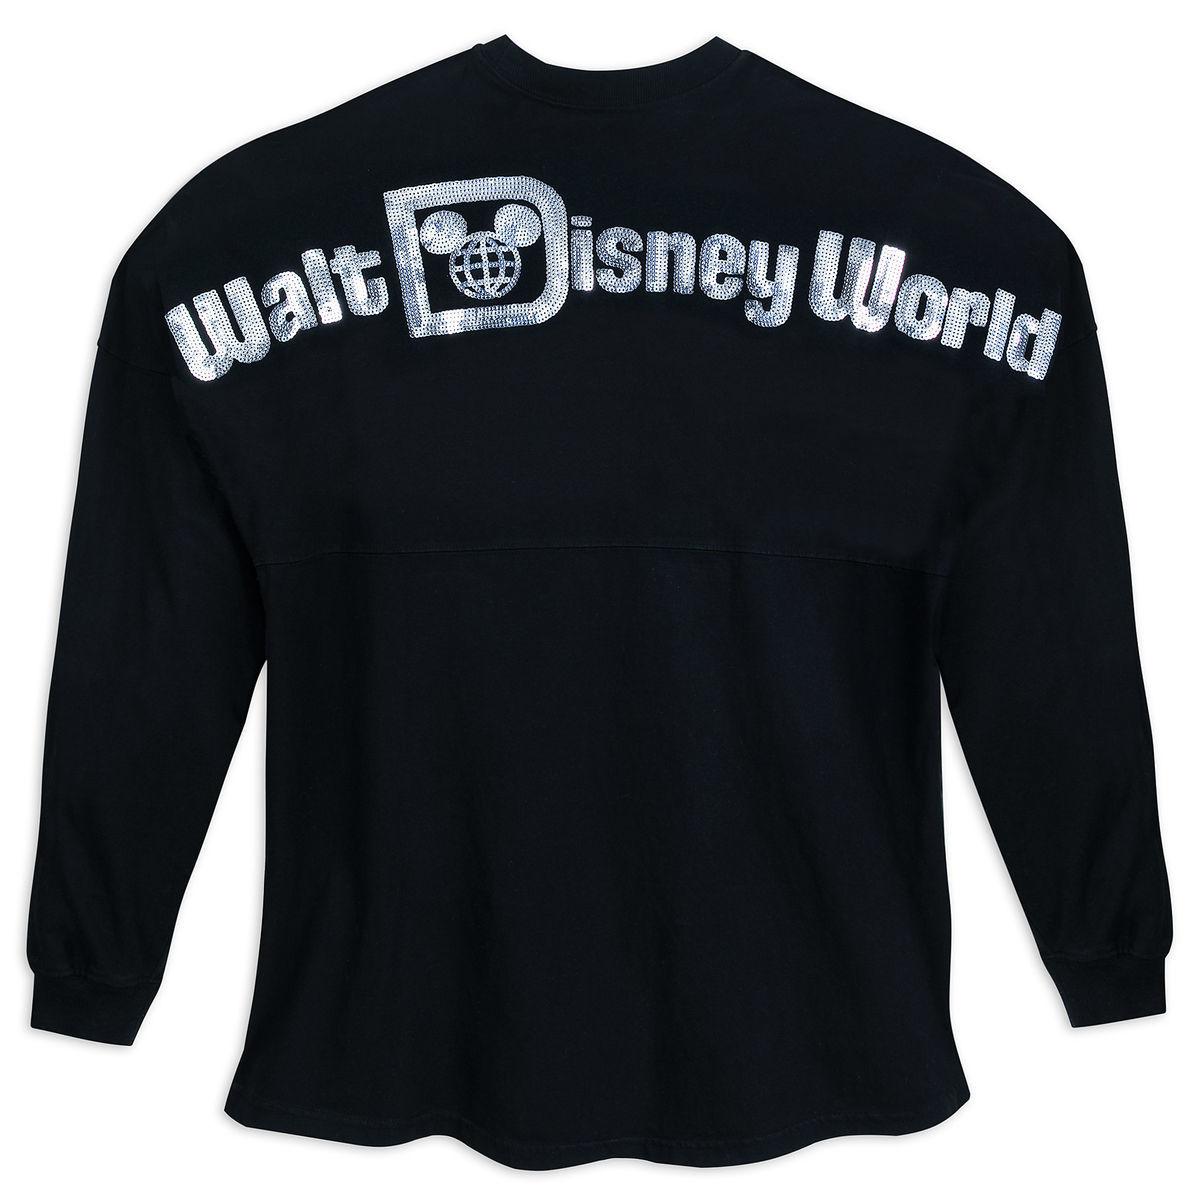 6ab293f617e Disney Adult Shirt - Walt Disney World Spirit Jersey - Black Sequined